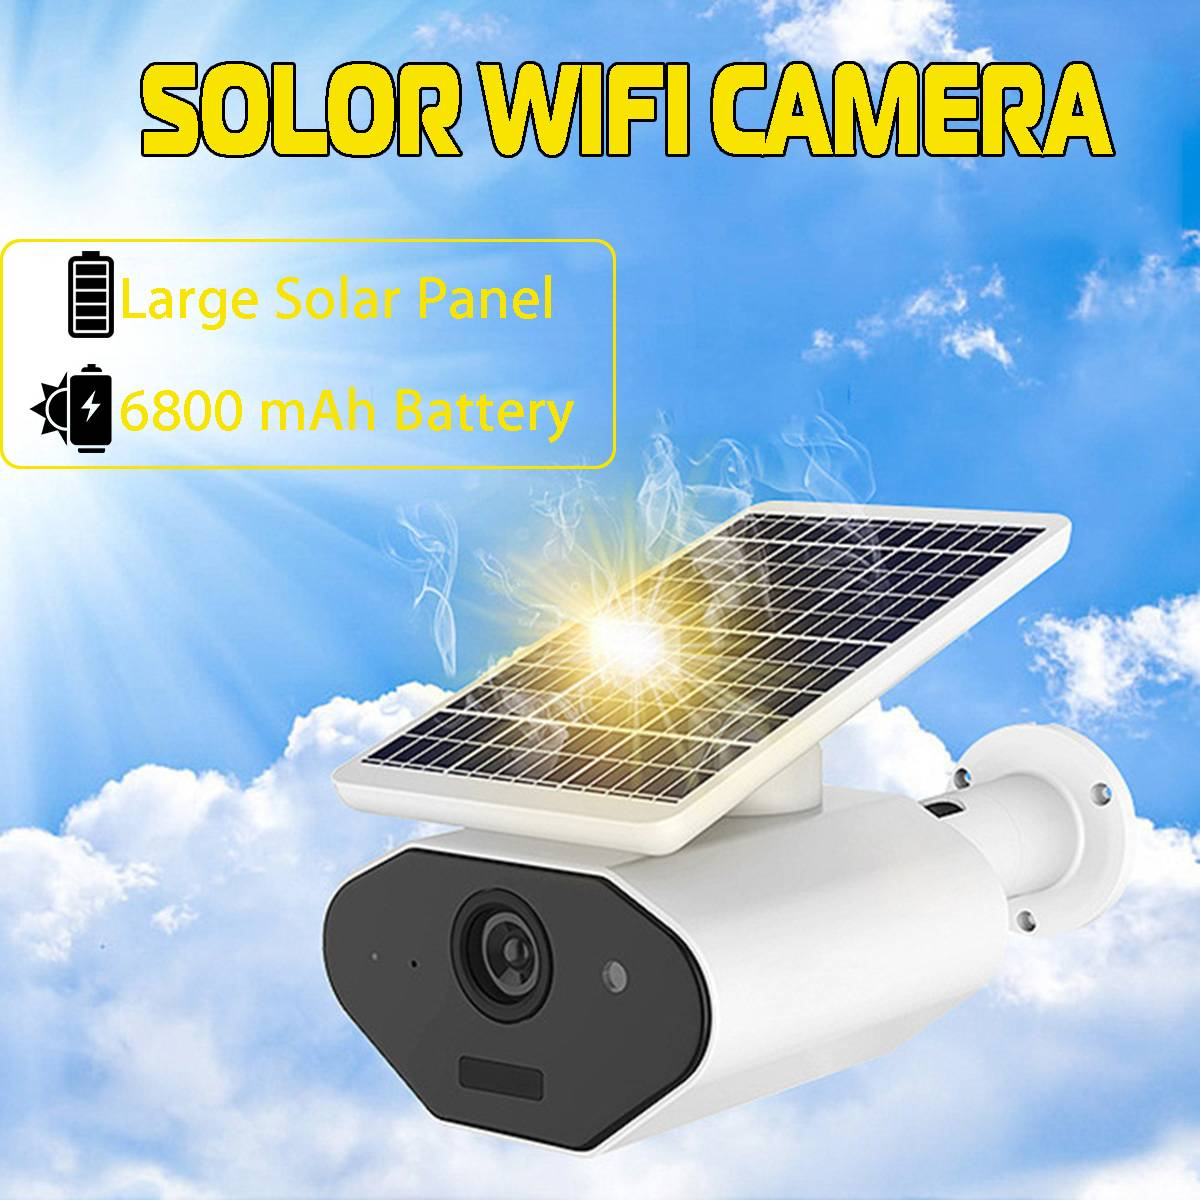 WIFI Wireless Solar Powered Surveillance IP Camera 1080P 2.0MP Waterproof 143 Degrees Angle Intercom Indoor Outdoor CameraWIFI Wireless Solar Powered Surveillance IP Camera 1080P 2.0MP Waterproof 143 Degrees Angle Intercom Indoor Outdoor Camera